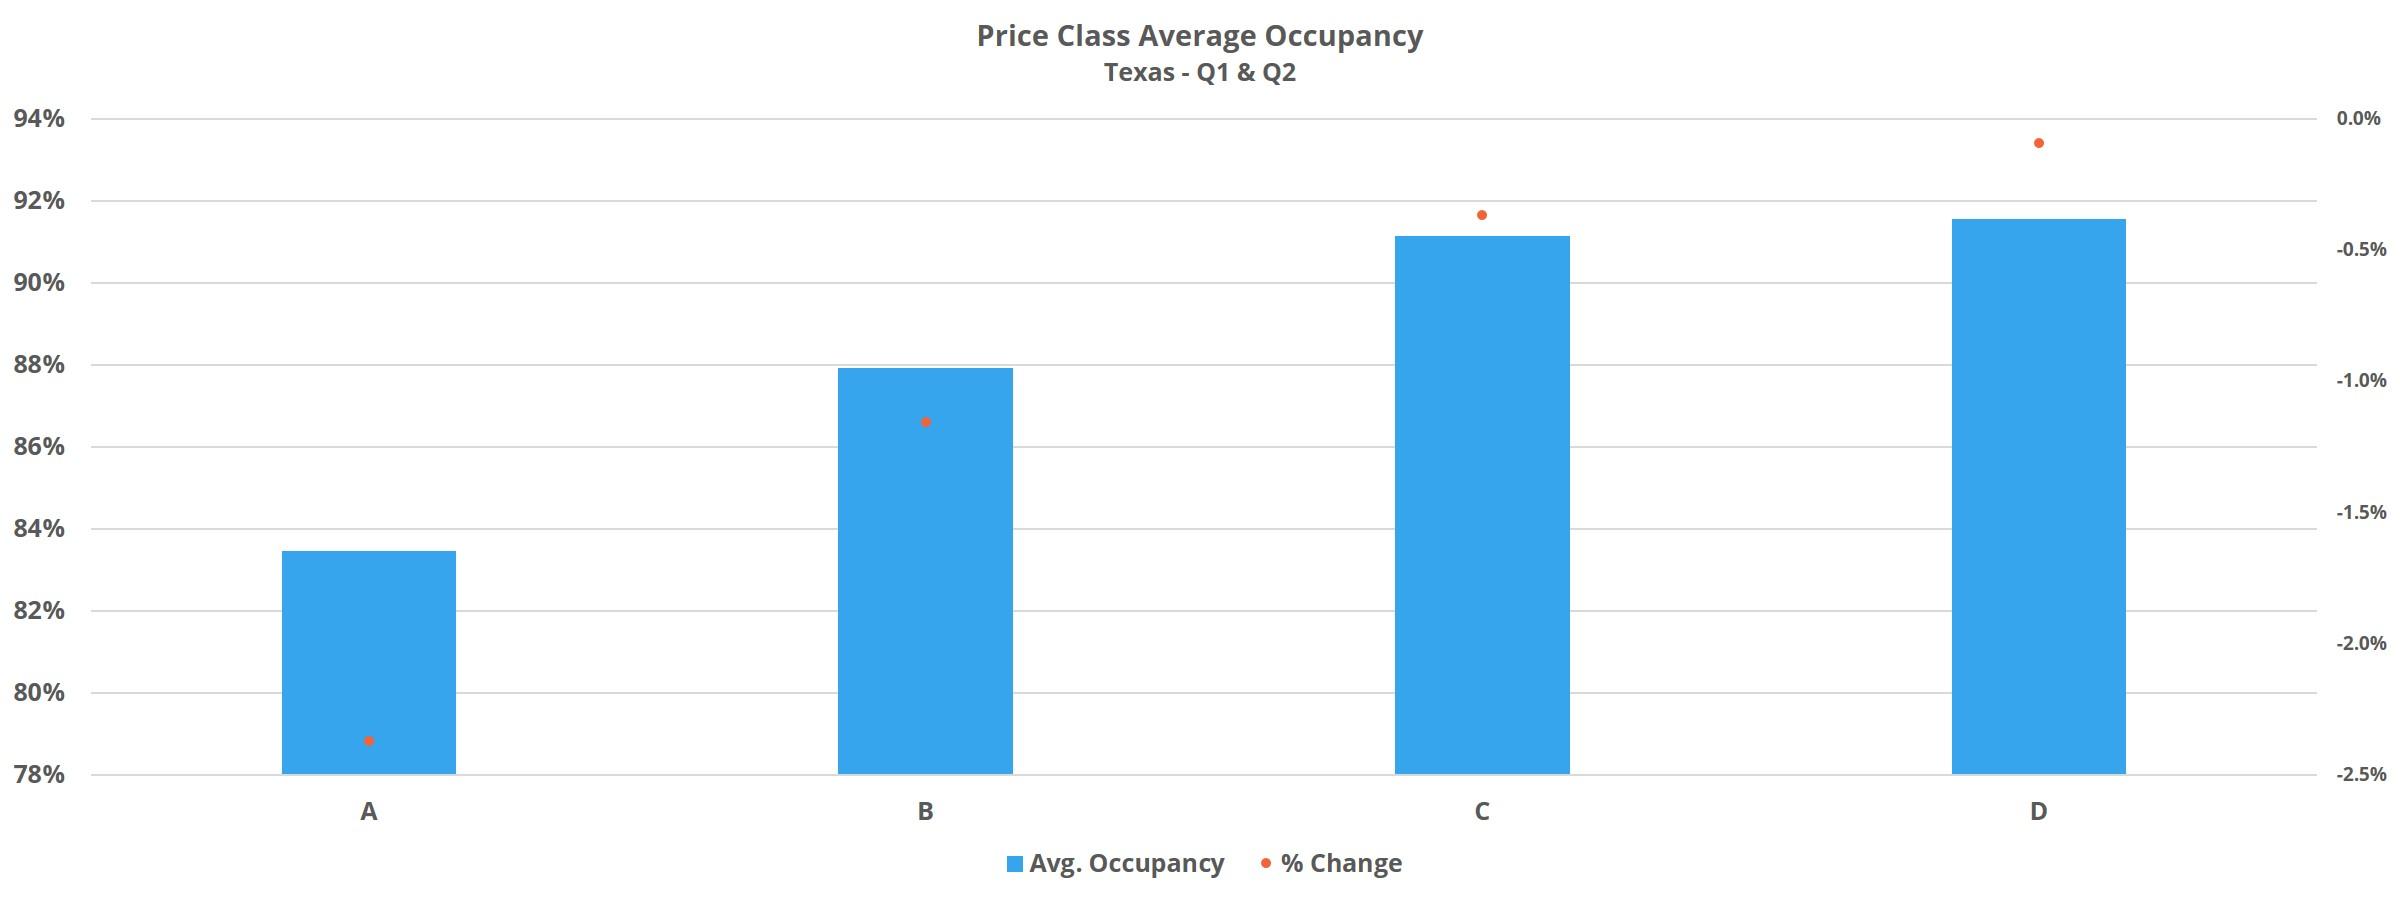 Price Class Average Occupancy